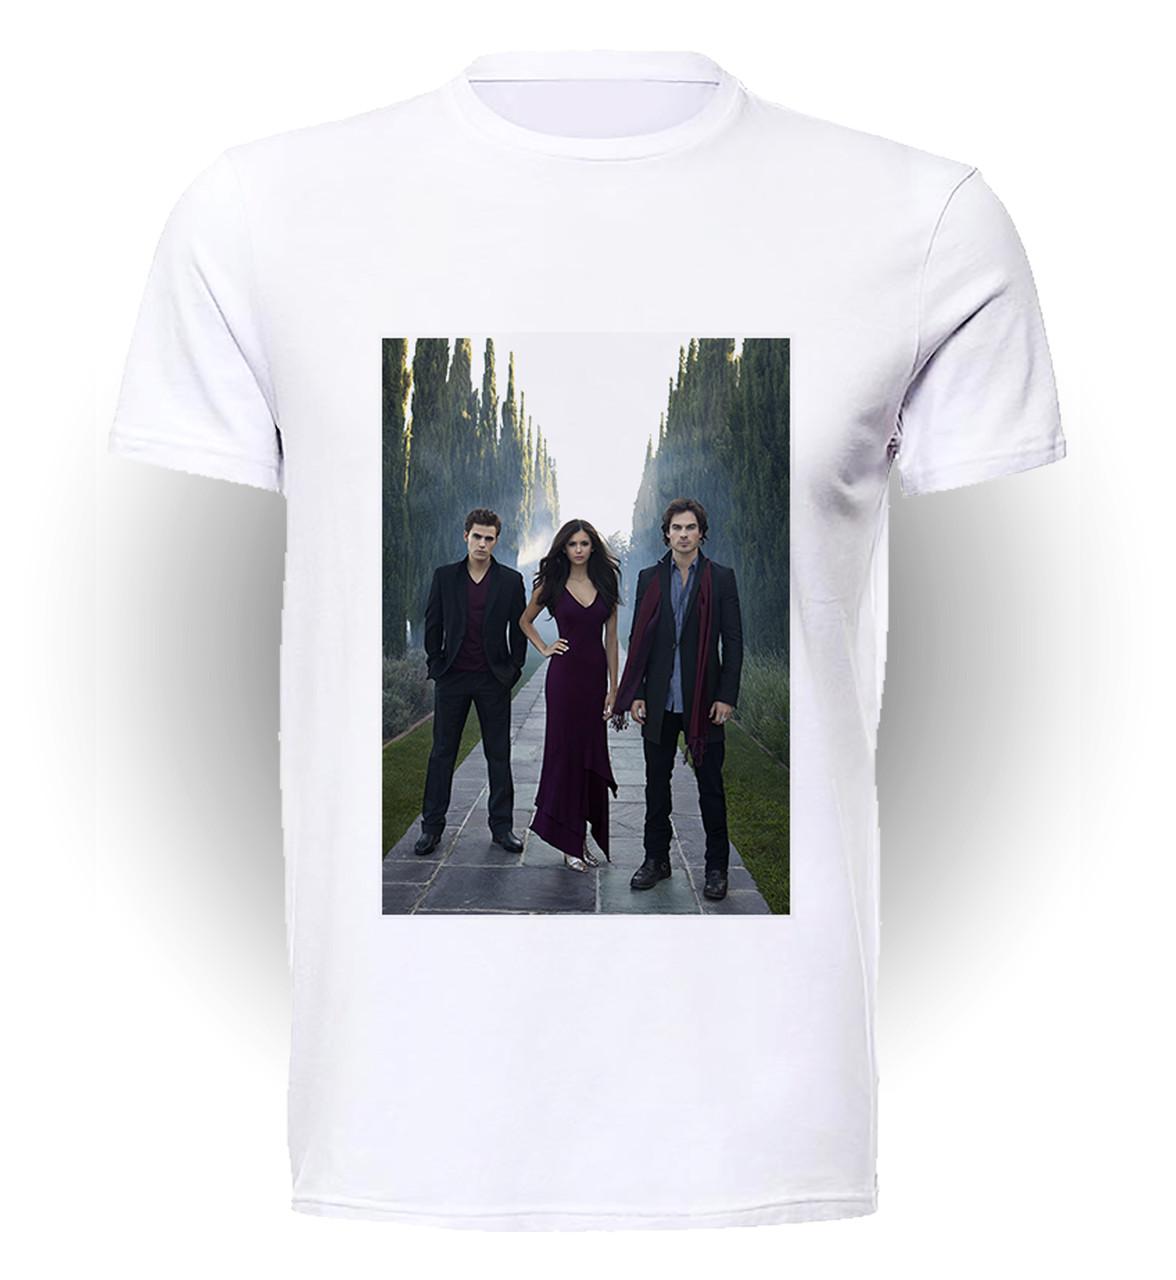 Футболка GeekLand Дневники Вампира The Vampire Diaries втроём VD.01.016